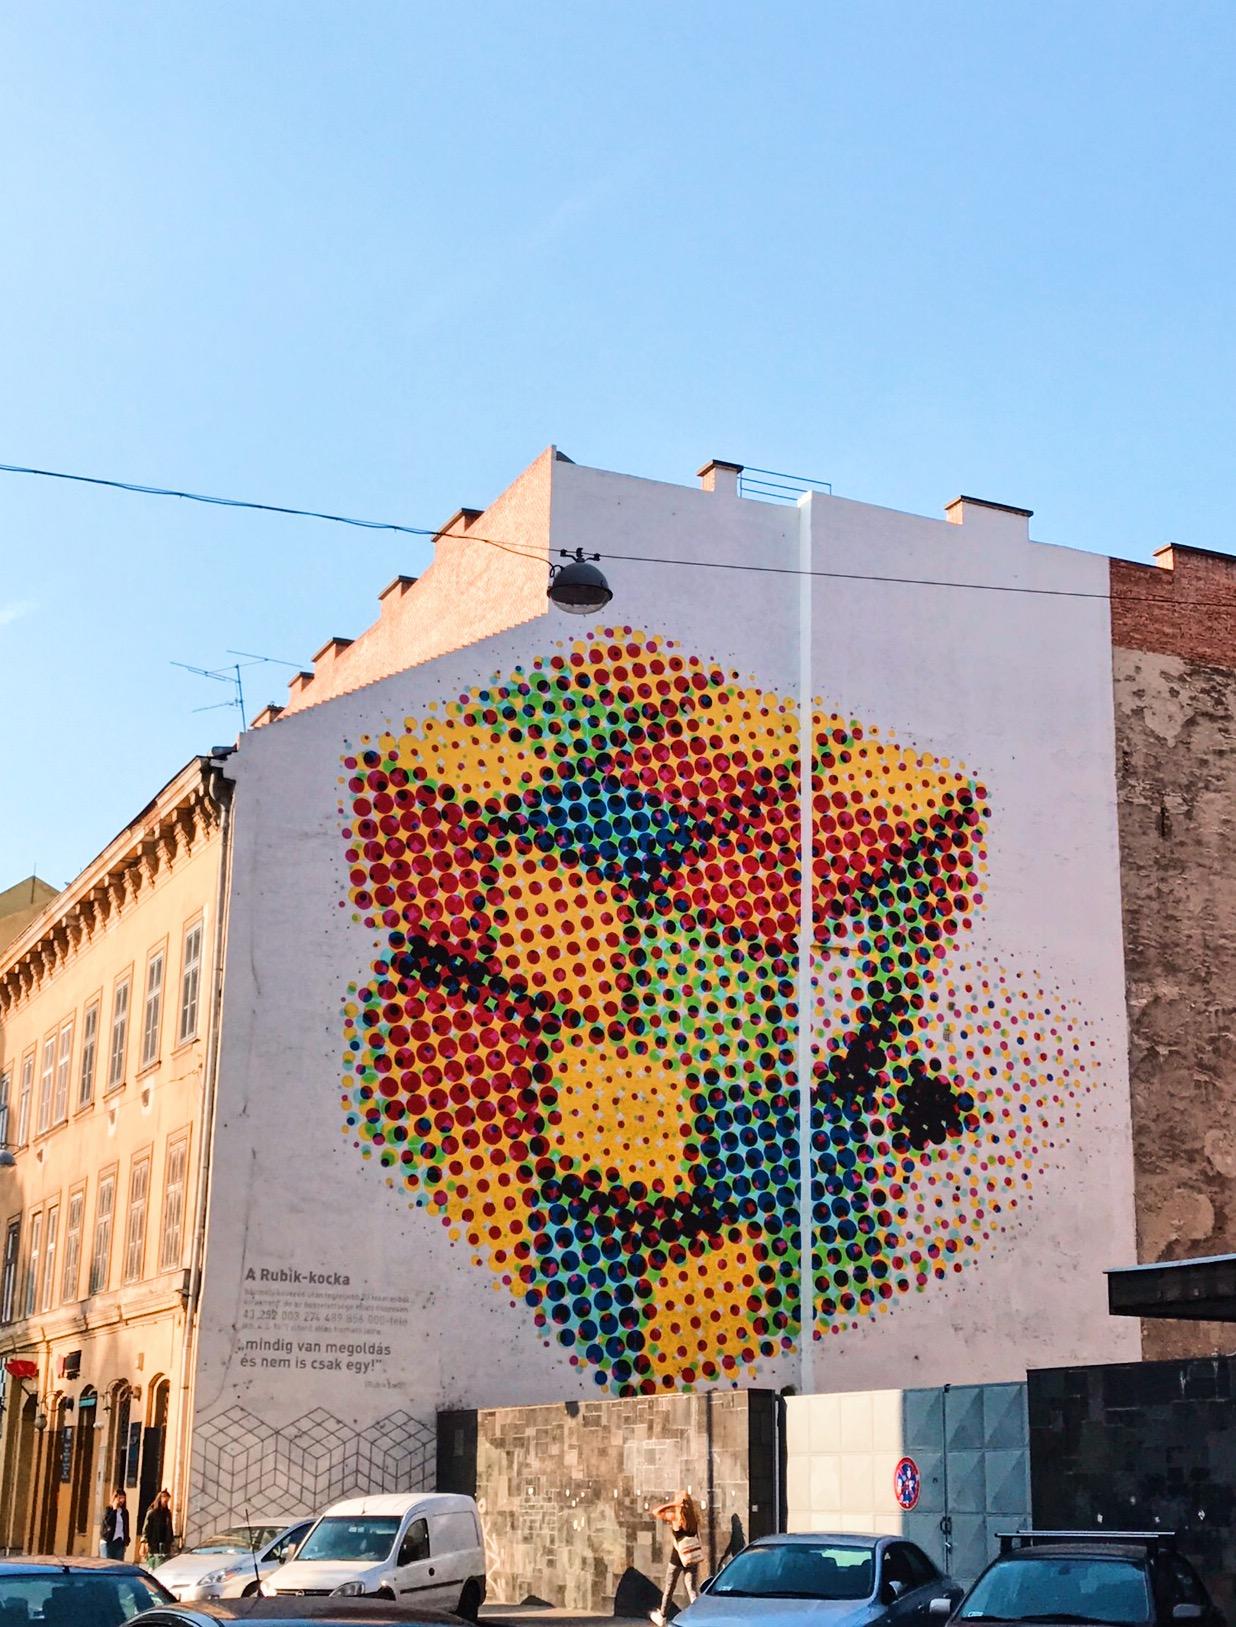 Part of the Budapest free Street Art & Graffiti Tour